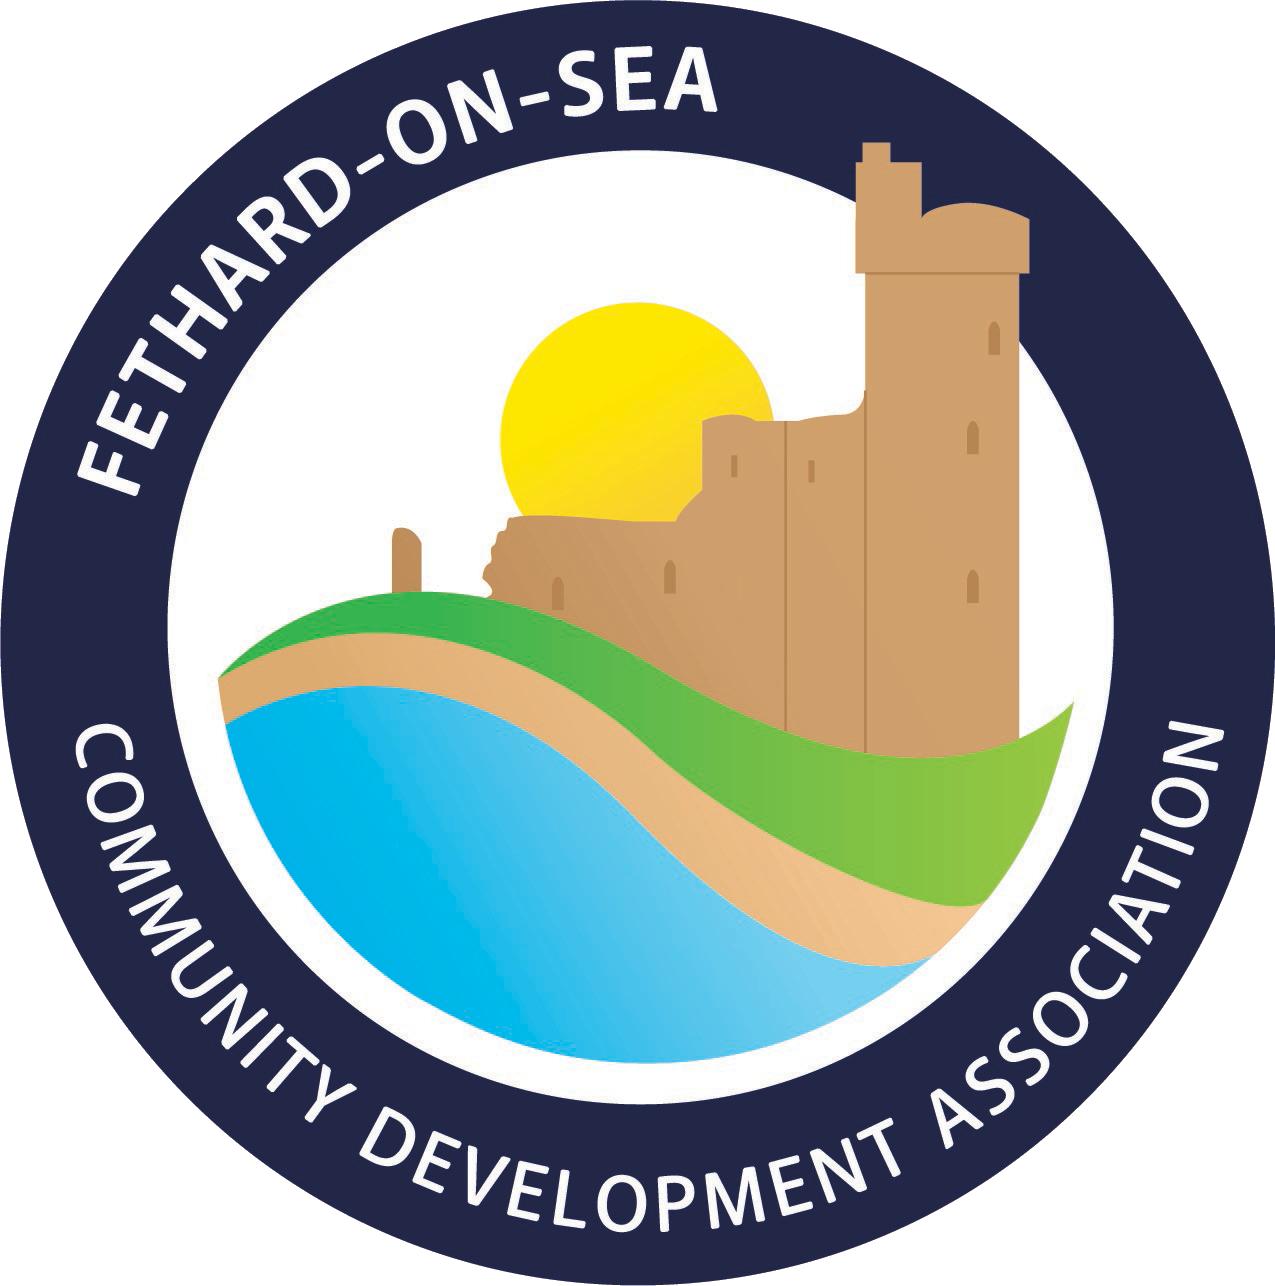 Fethard on Sea Community Development Association